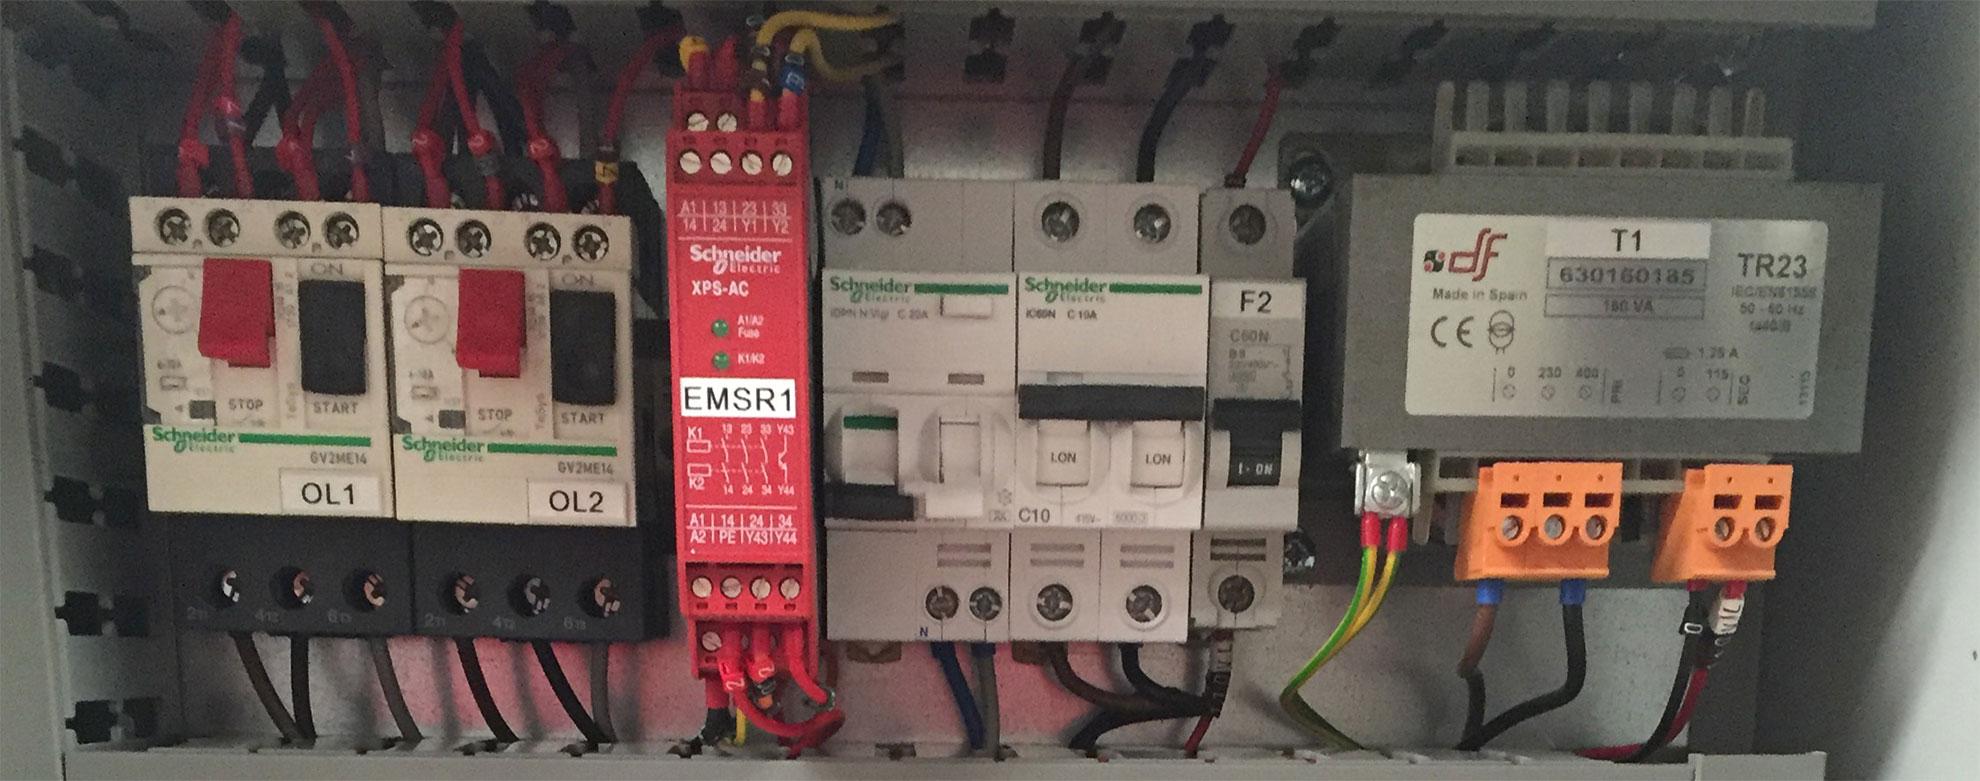 Trident Controls Electrical Control Panel Slide 02 BG